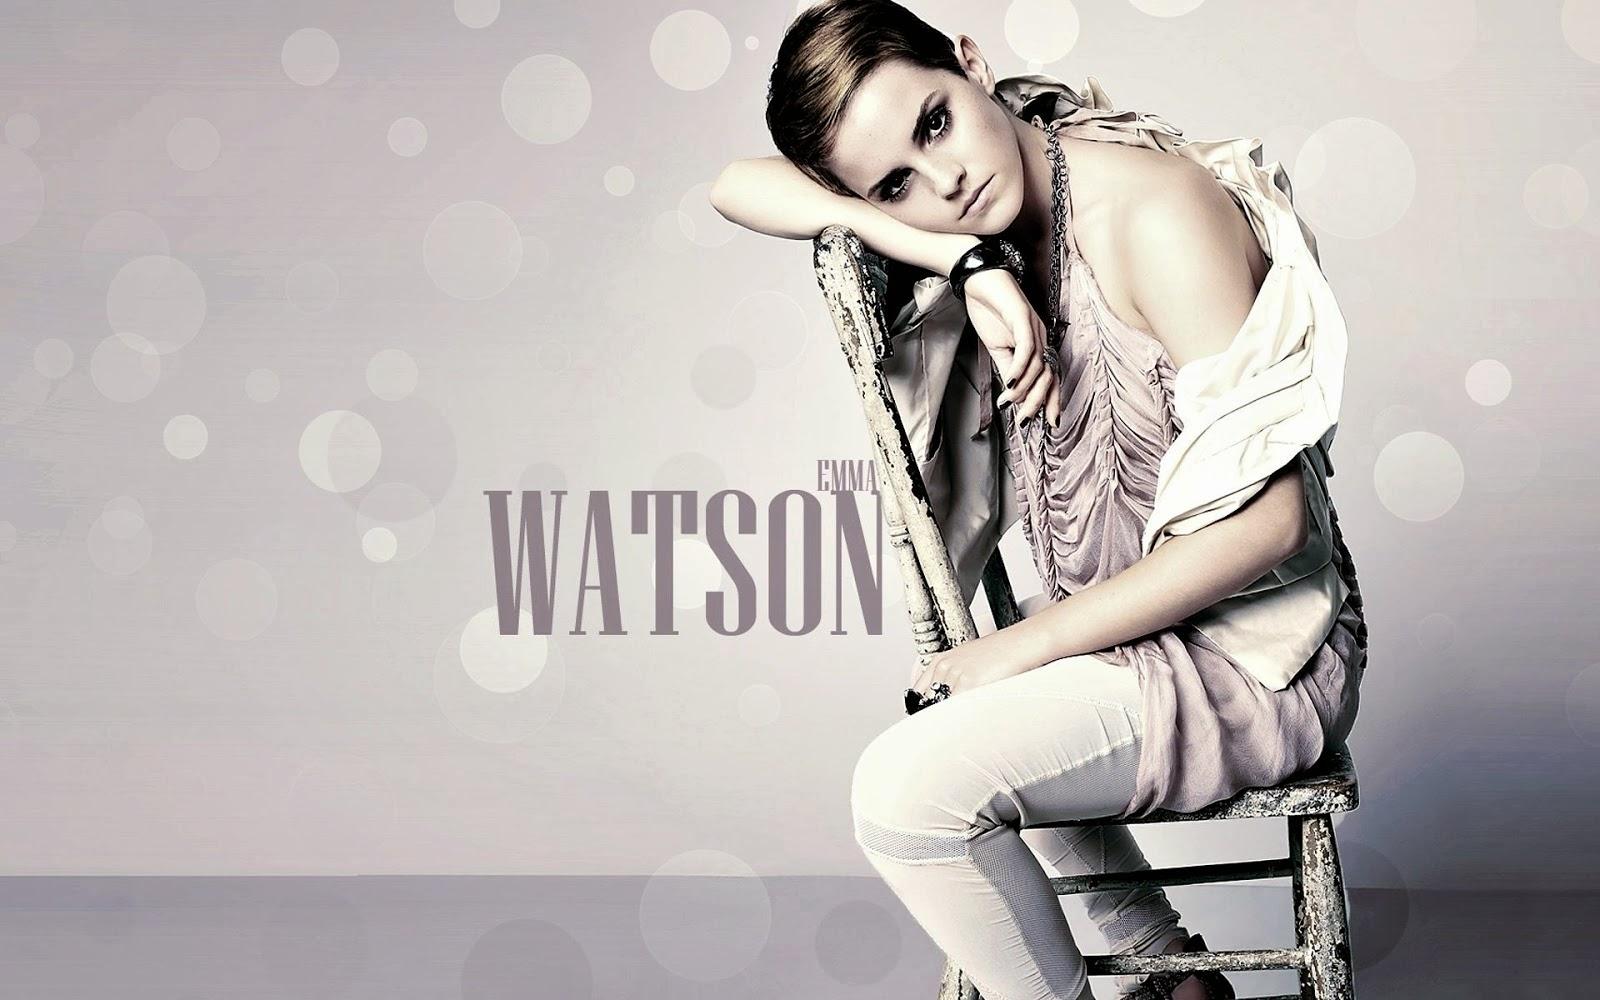 Emma Watson hot hd Wallpapers 2014